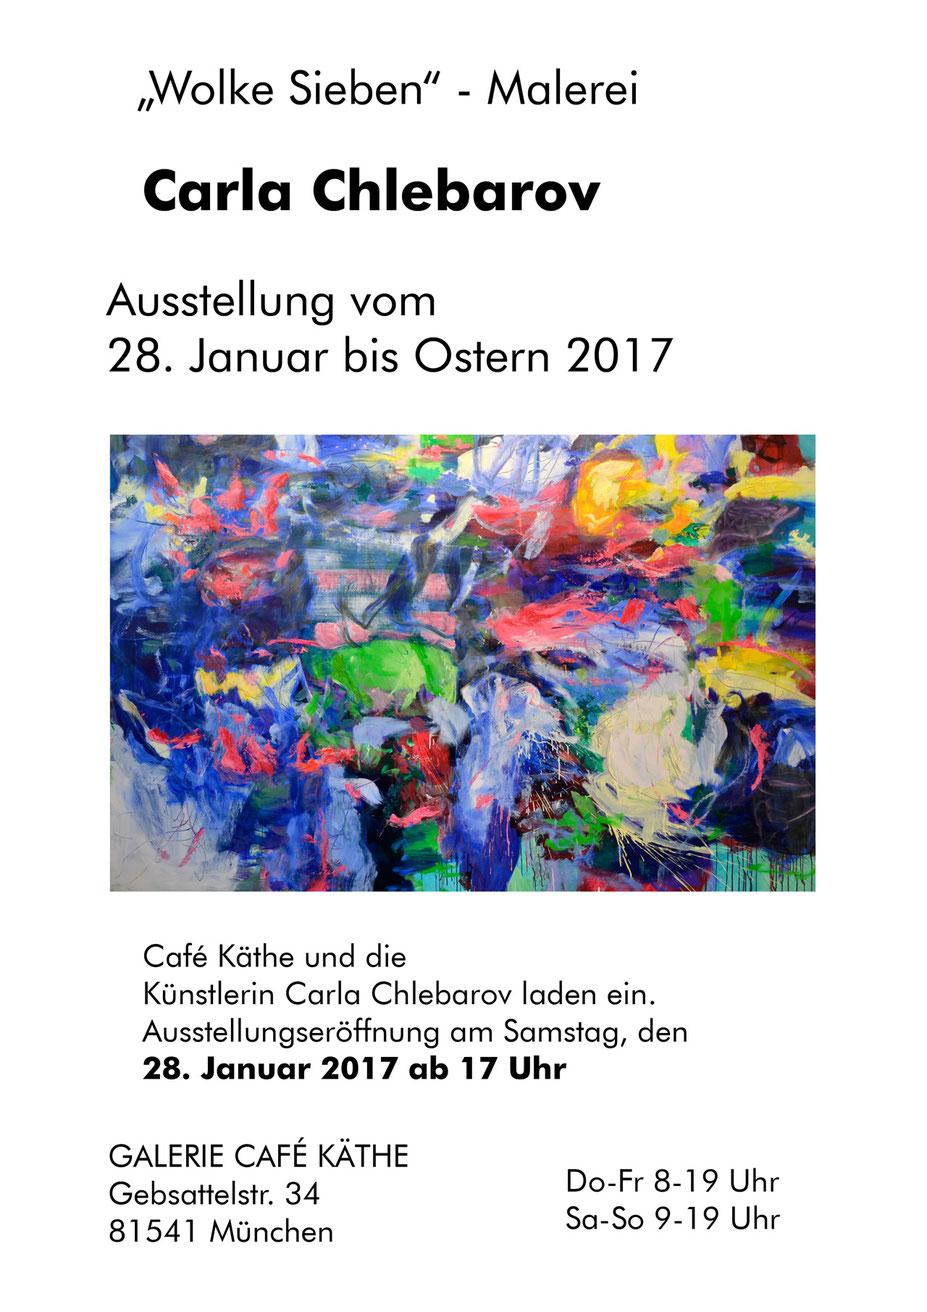 Carla Chlebarov - Wolke Sieben Galerie Cafe Käthe 2017